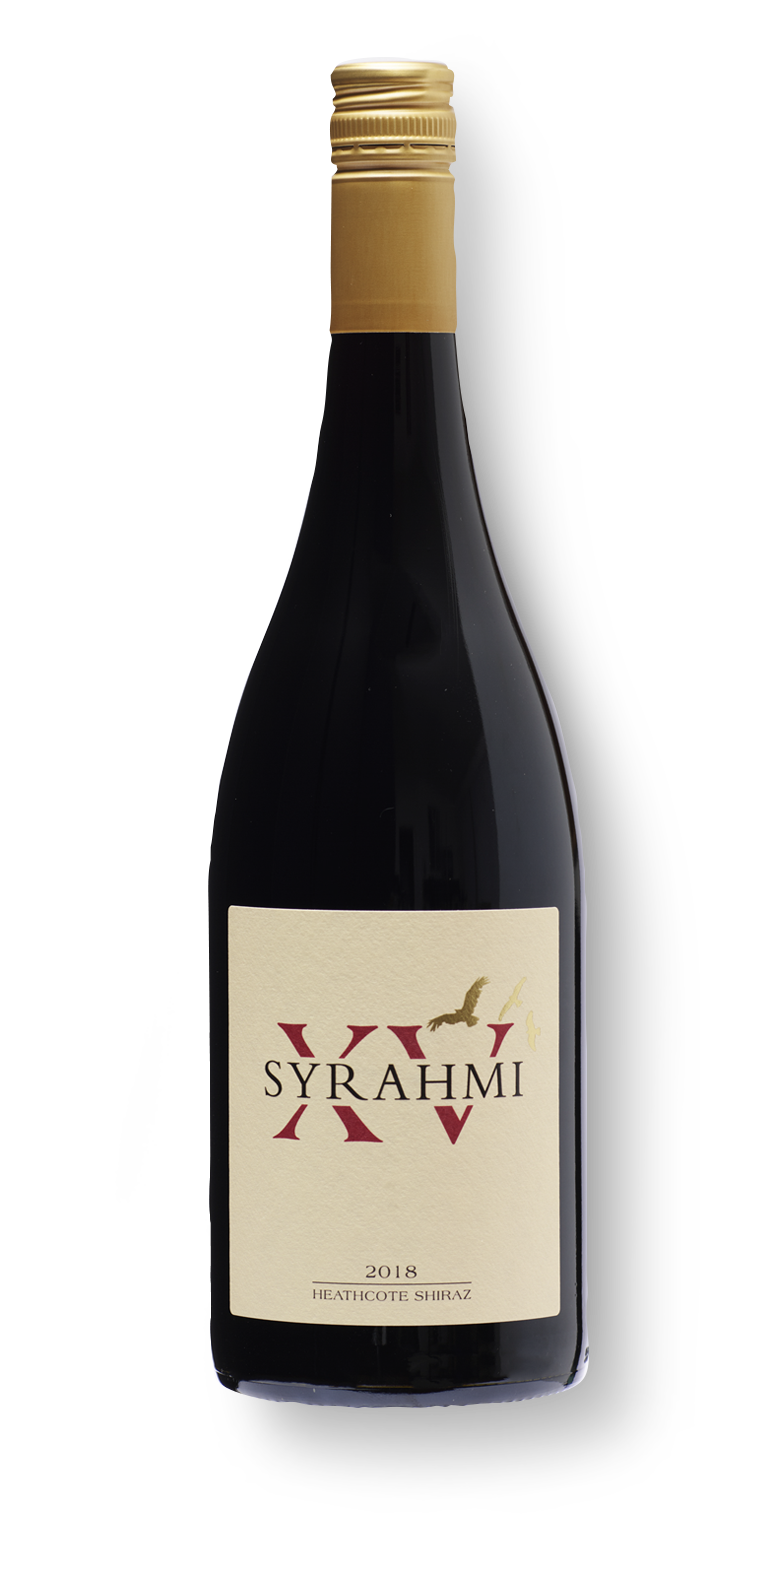 2018-syrahmi-XV